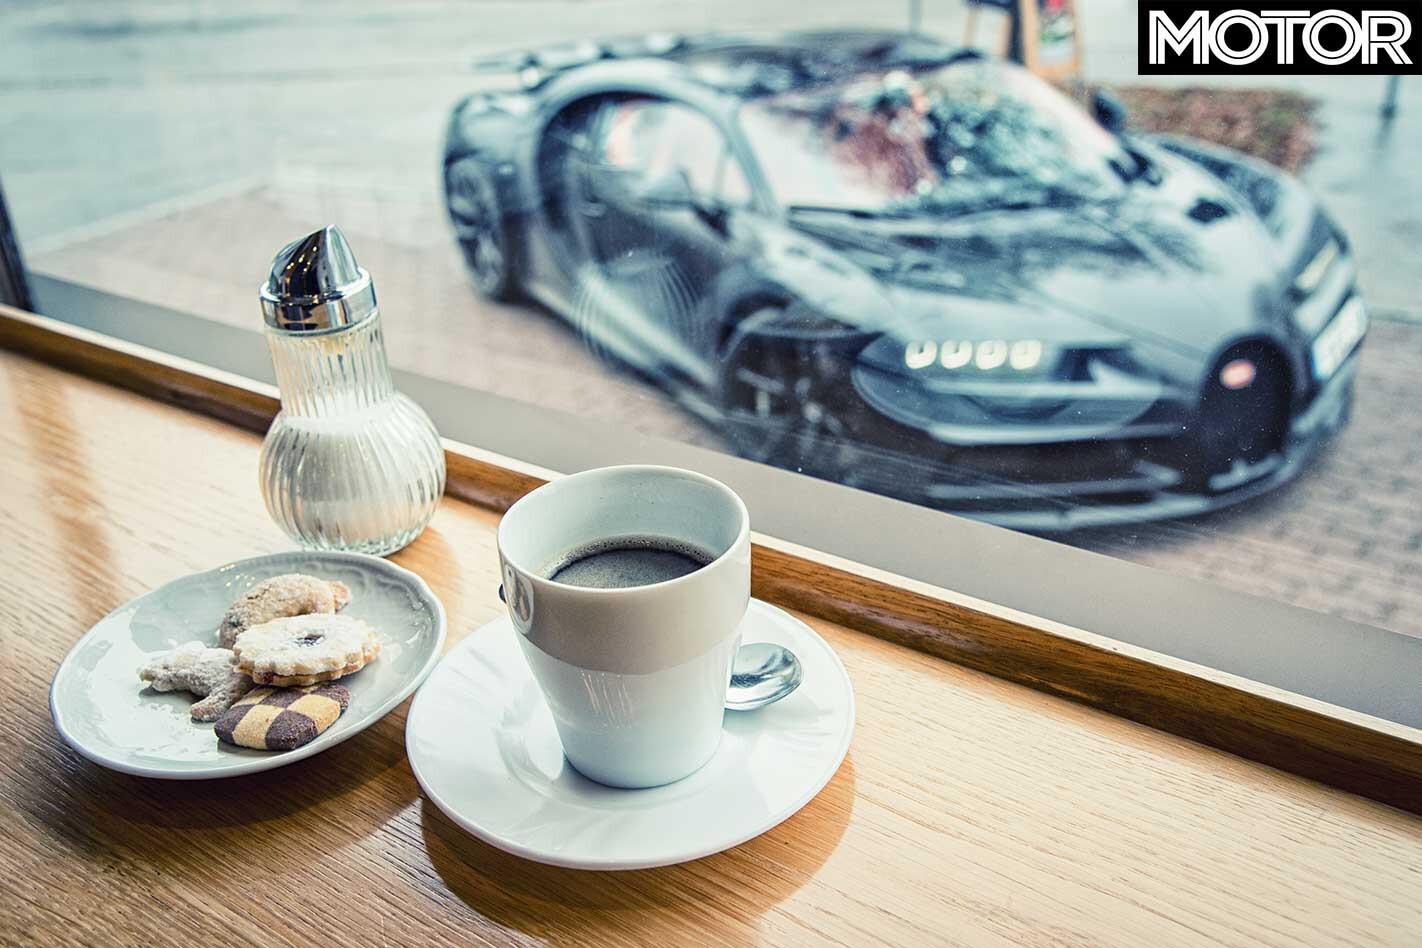 24 Hours 2019 Bugatti Chiron Cafe Jpg